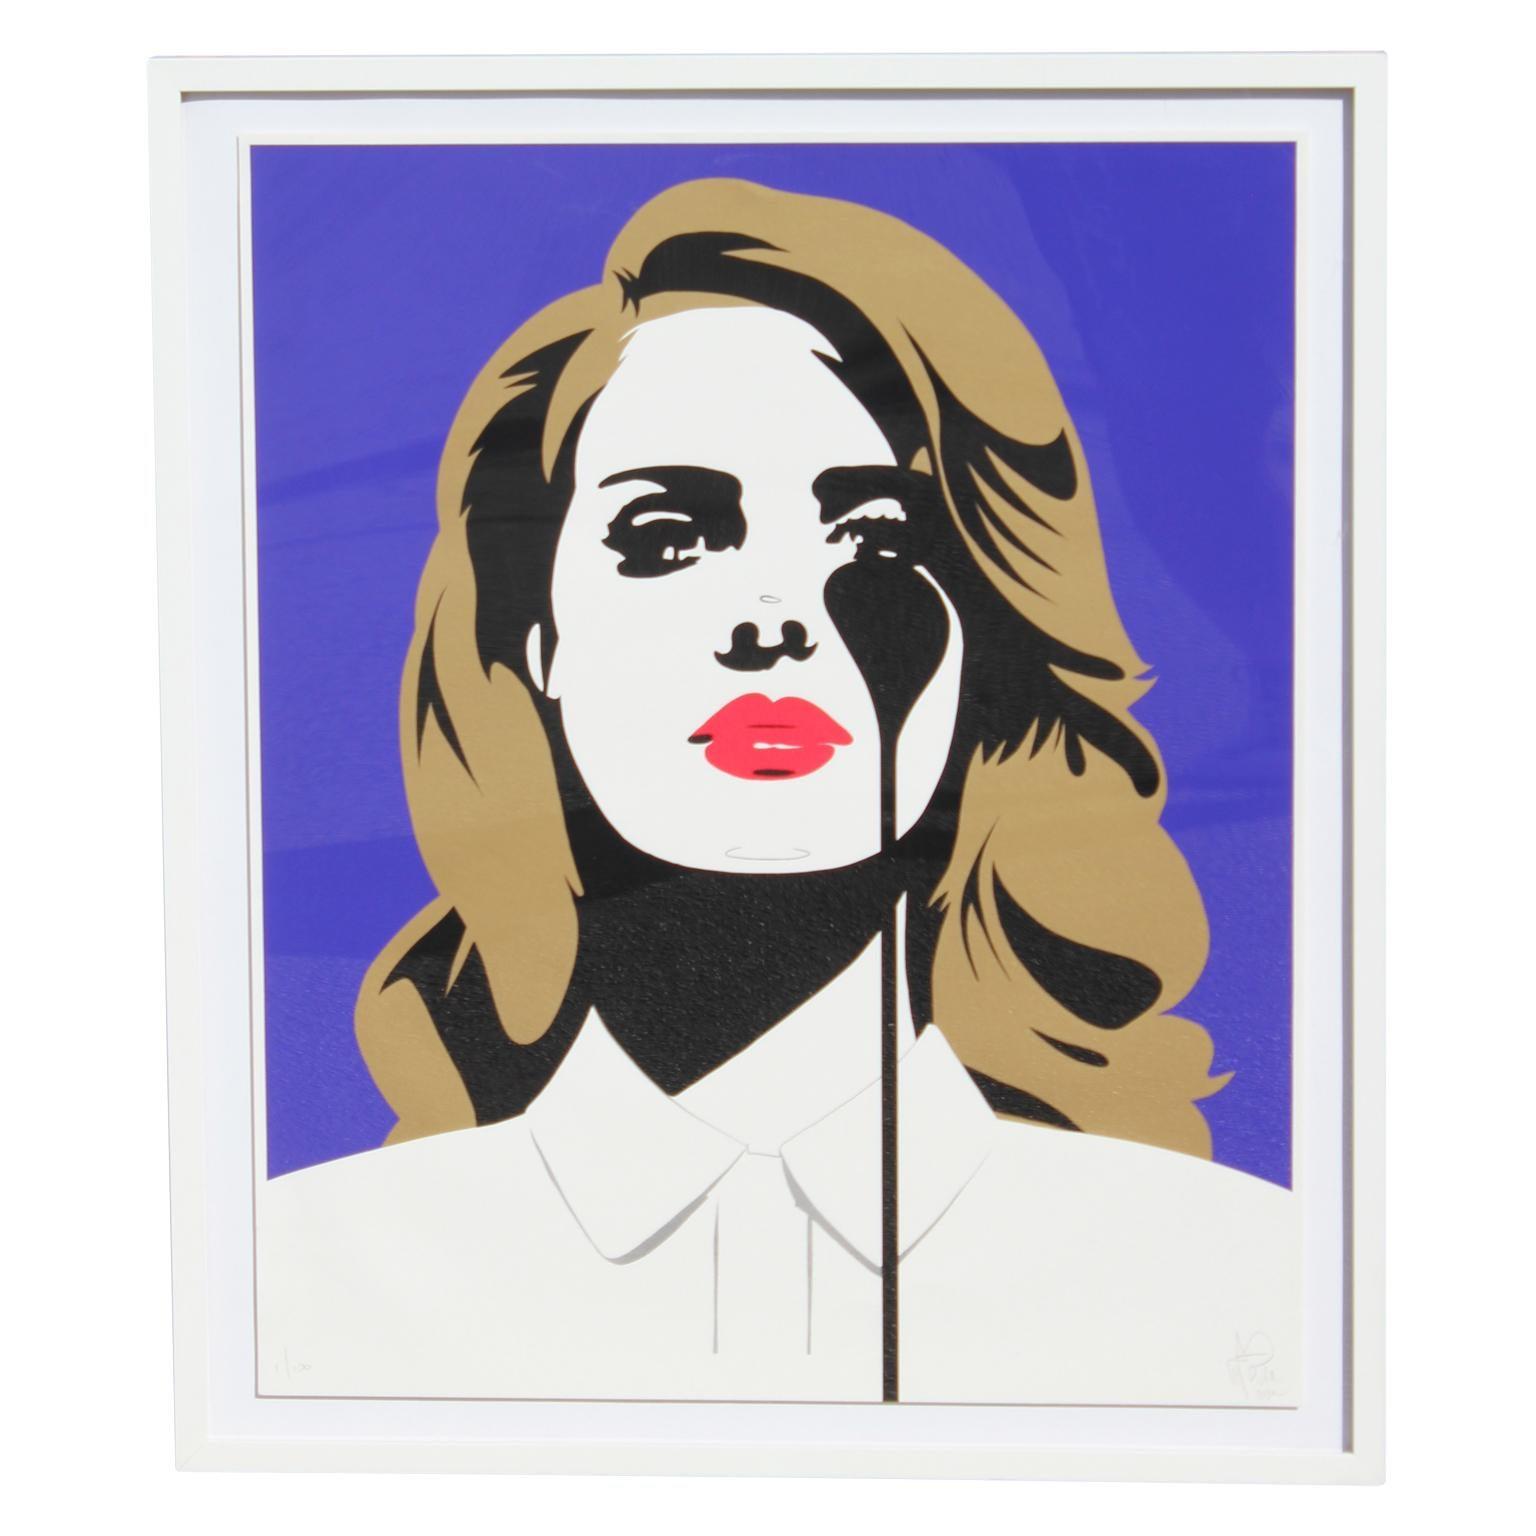 Pure Evil Lana Del Rey Pop Art Silkscreen Print Edition 1 100 At 1stdibs